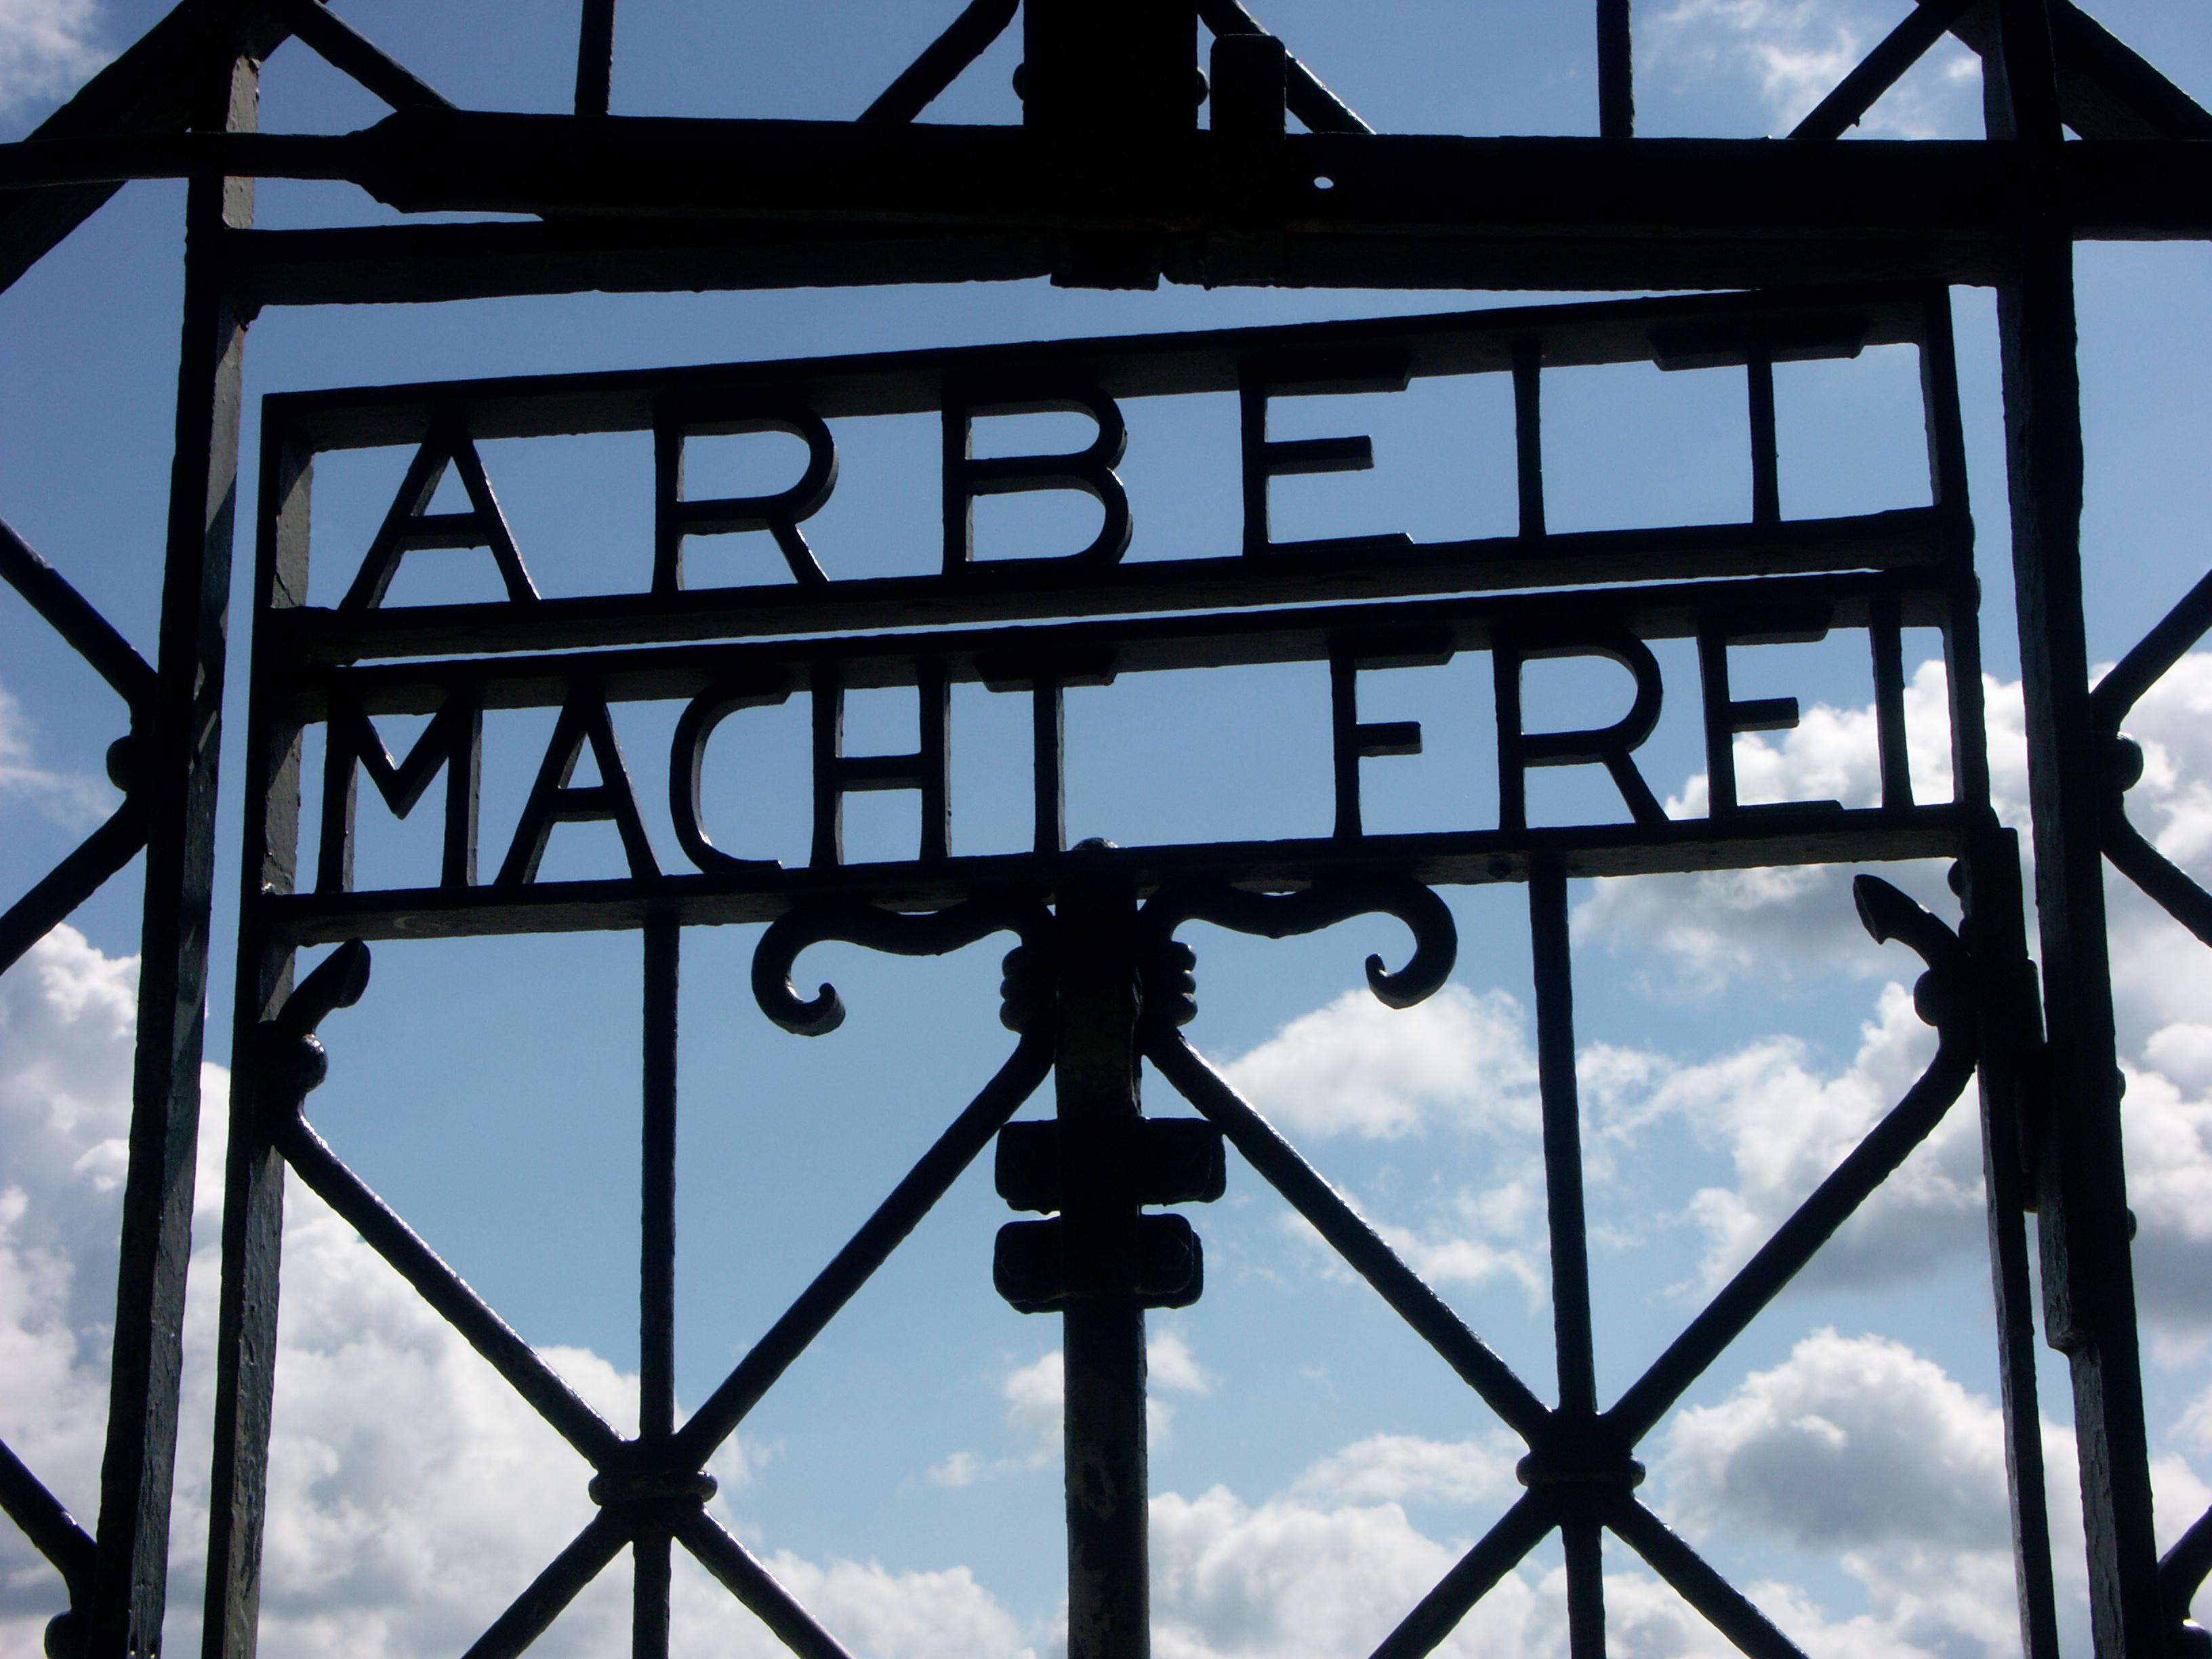 http://upload.wikimedia.org/wikipedia/commons/f/ff/Arbeit_Macht_Frei_Dachau_8235.jpg